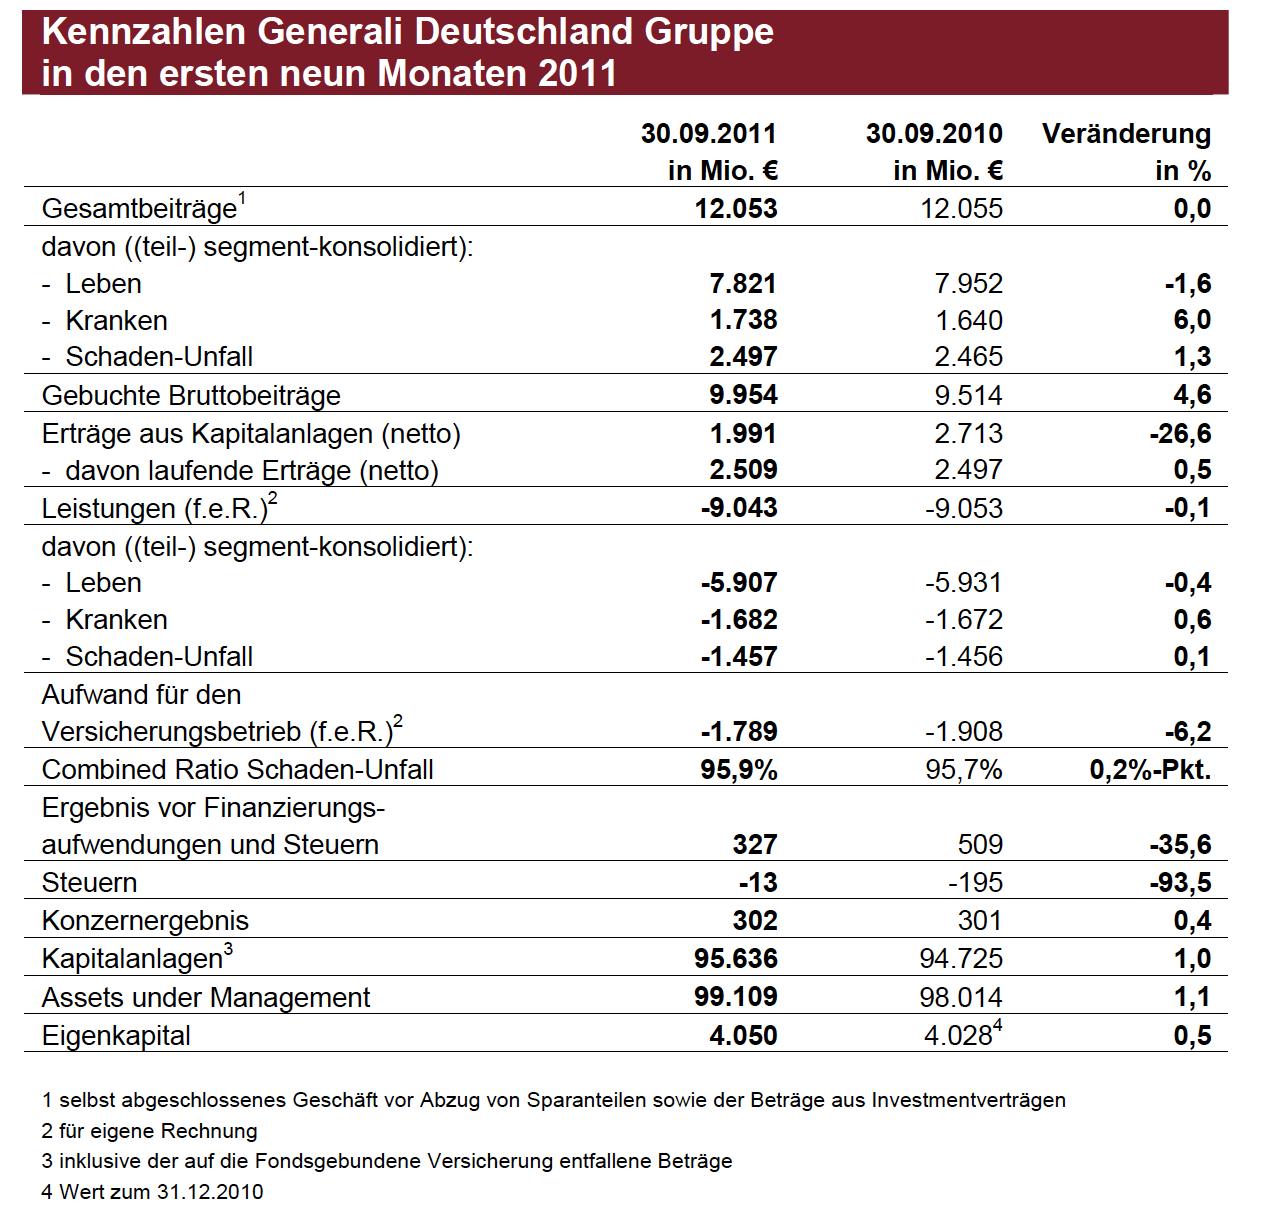 Generali-Ergebnis Erste-neun-Monate-2011 in Generali-Gewinn bleibt stabil